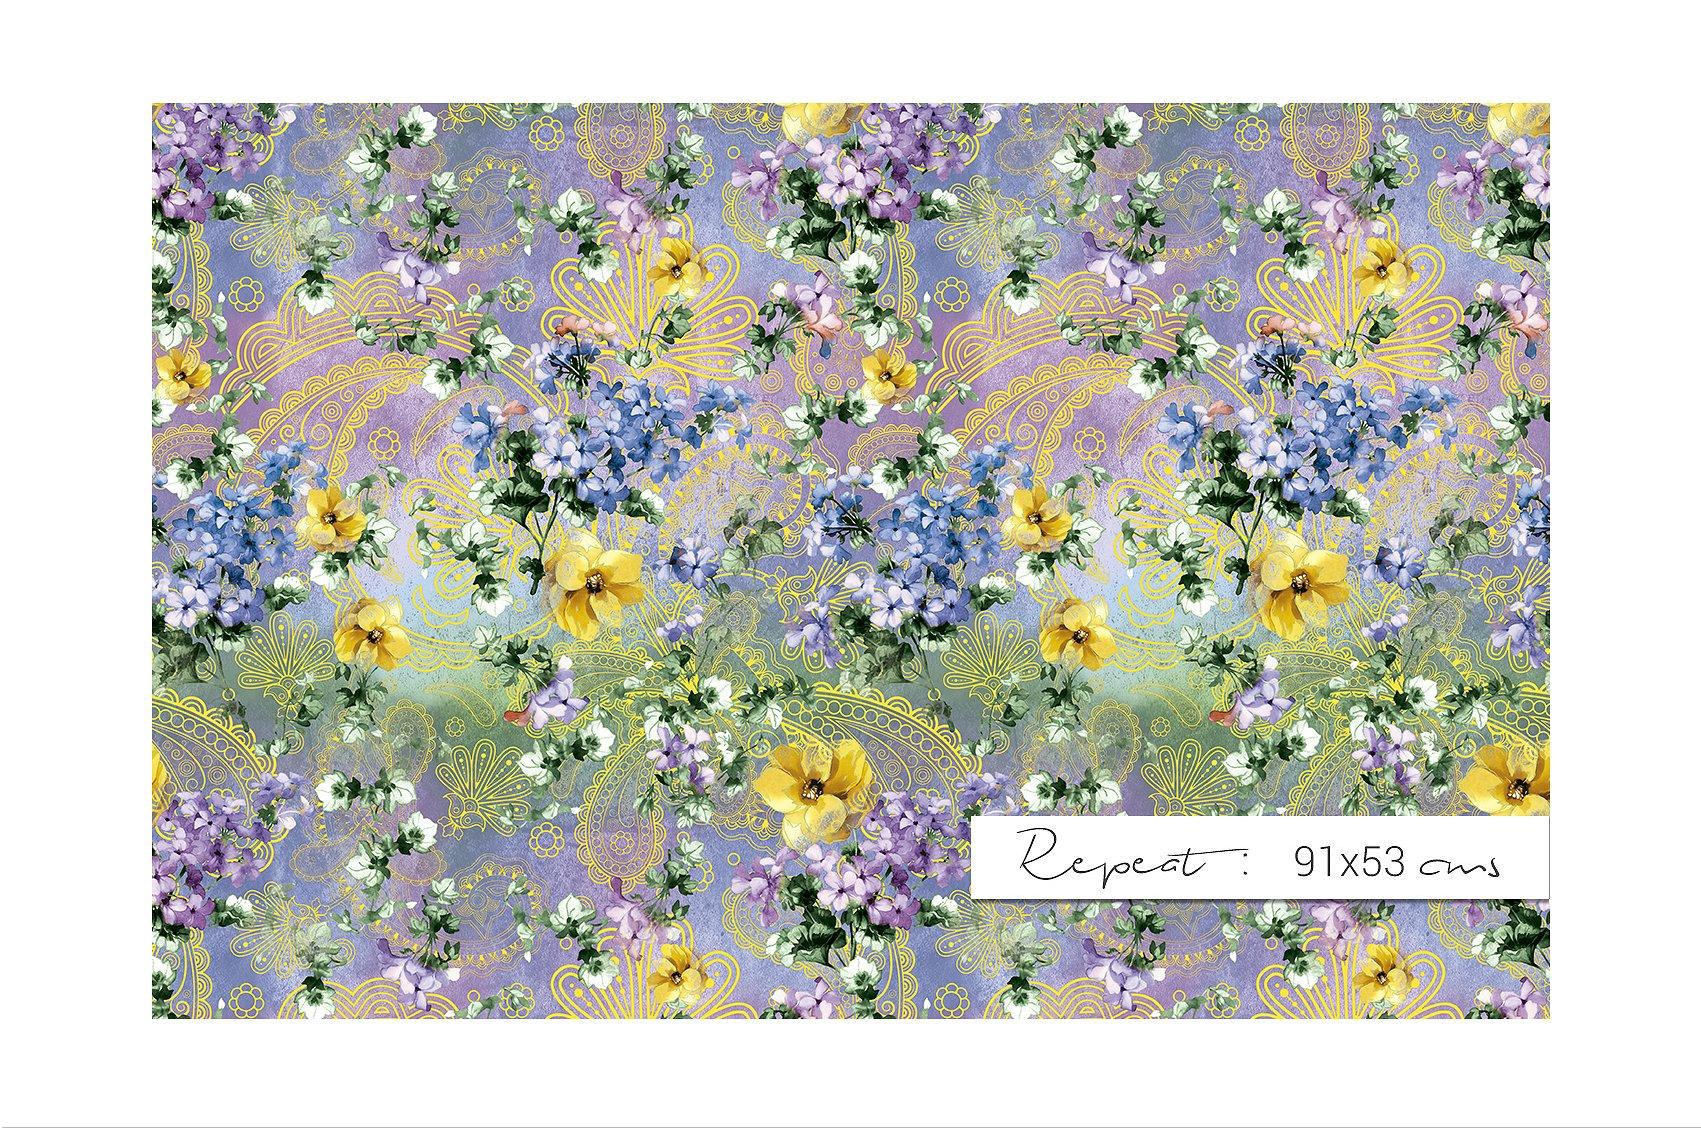 Garden of Eden Flowers Patterns clipArt example image 8